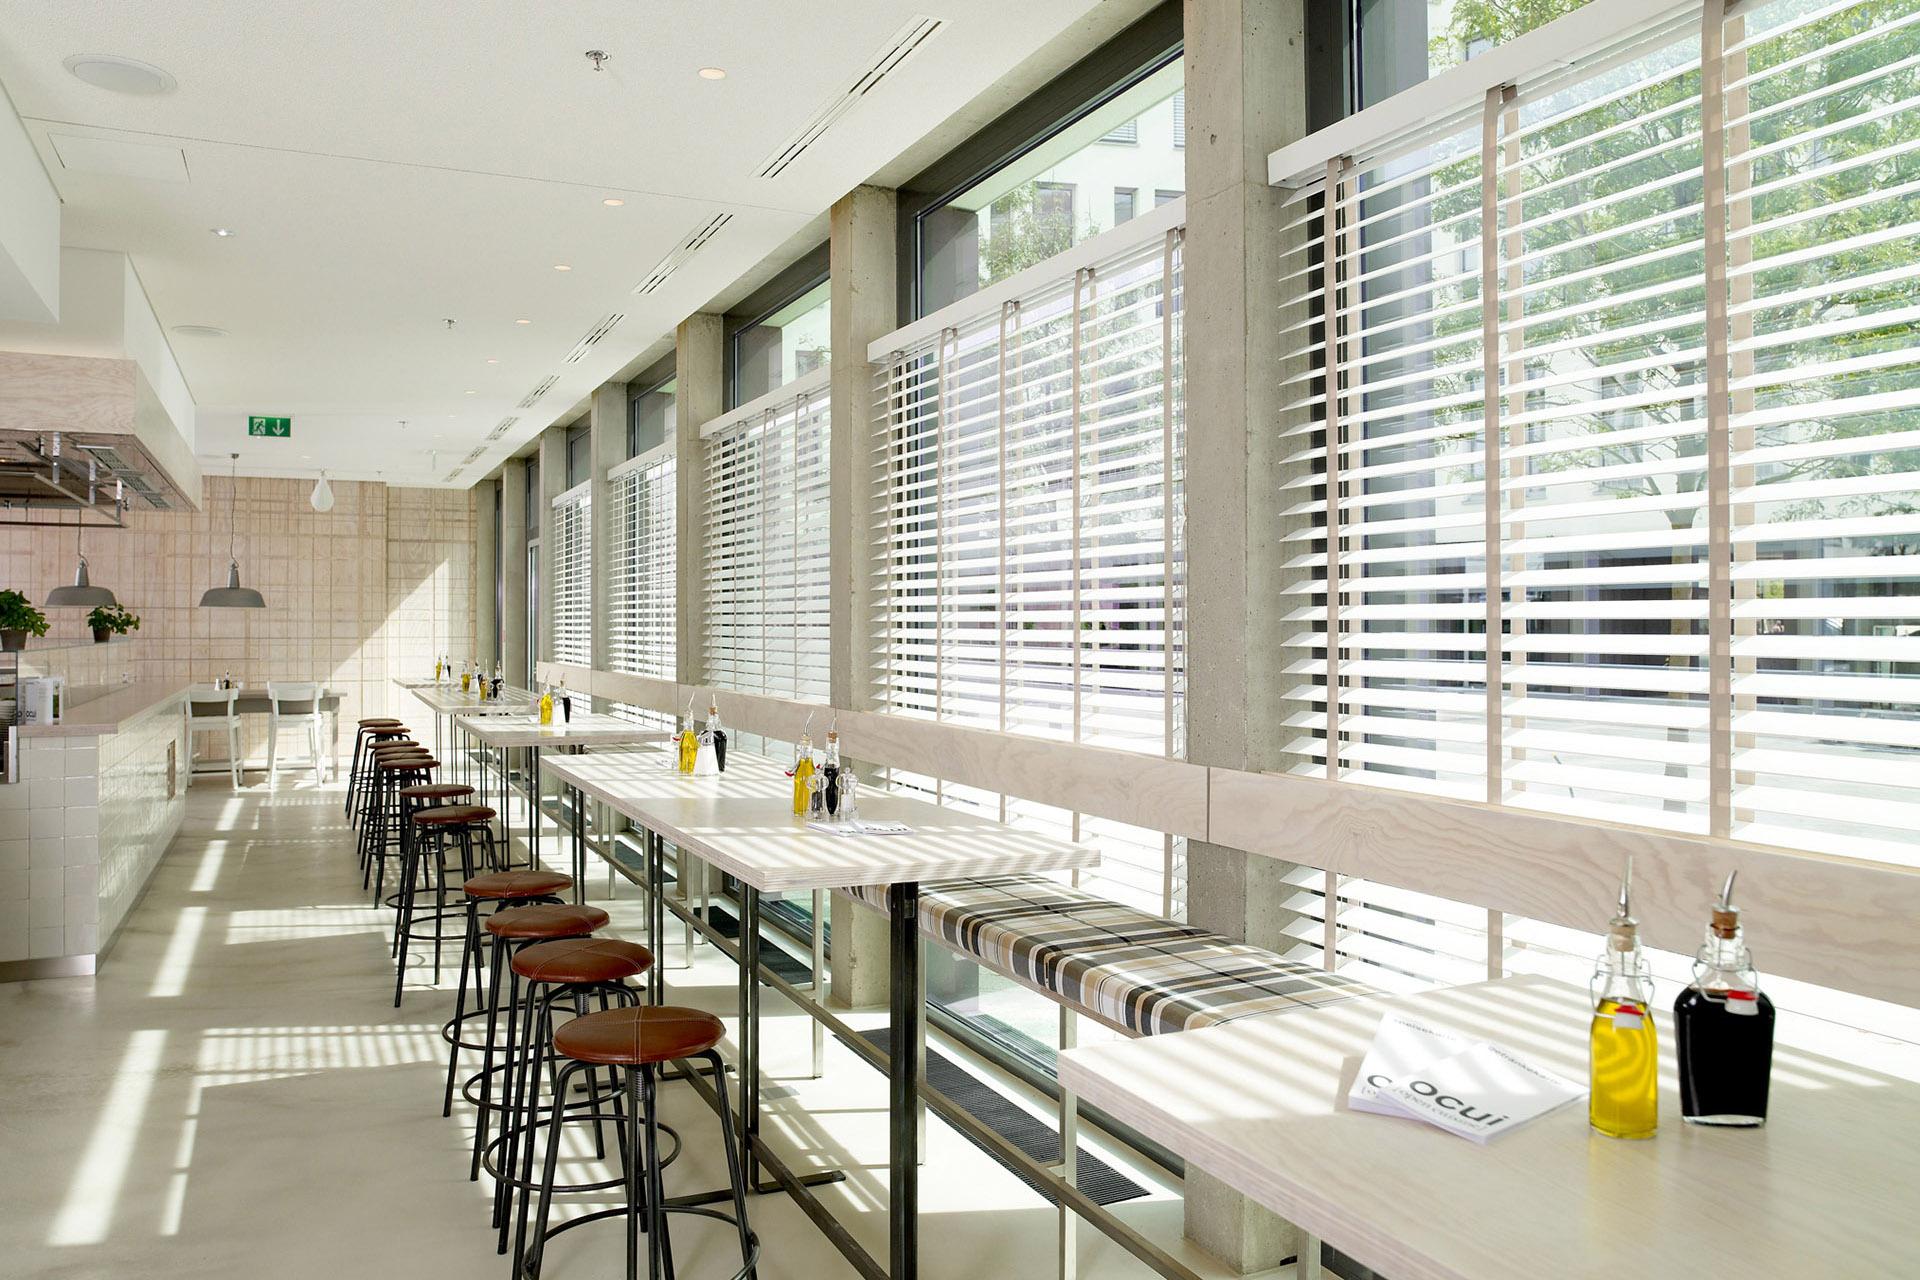 004-interior-design-hospitality-restaurant-ocui-open-cuisine-muenchen-buero-philipp-moeller.jpg